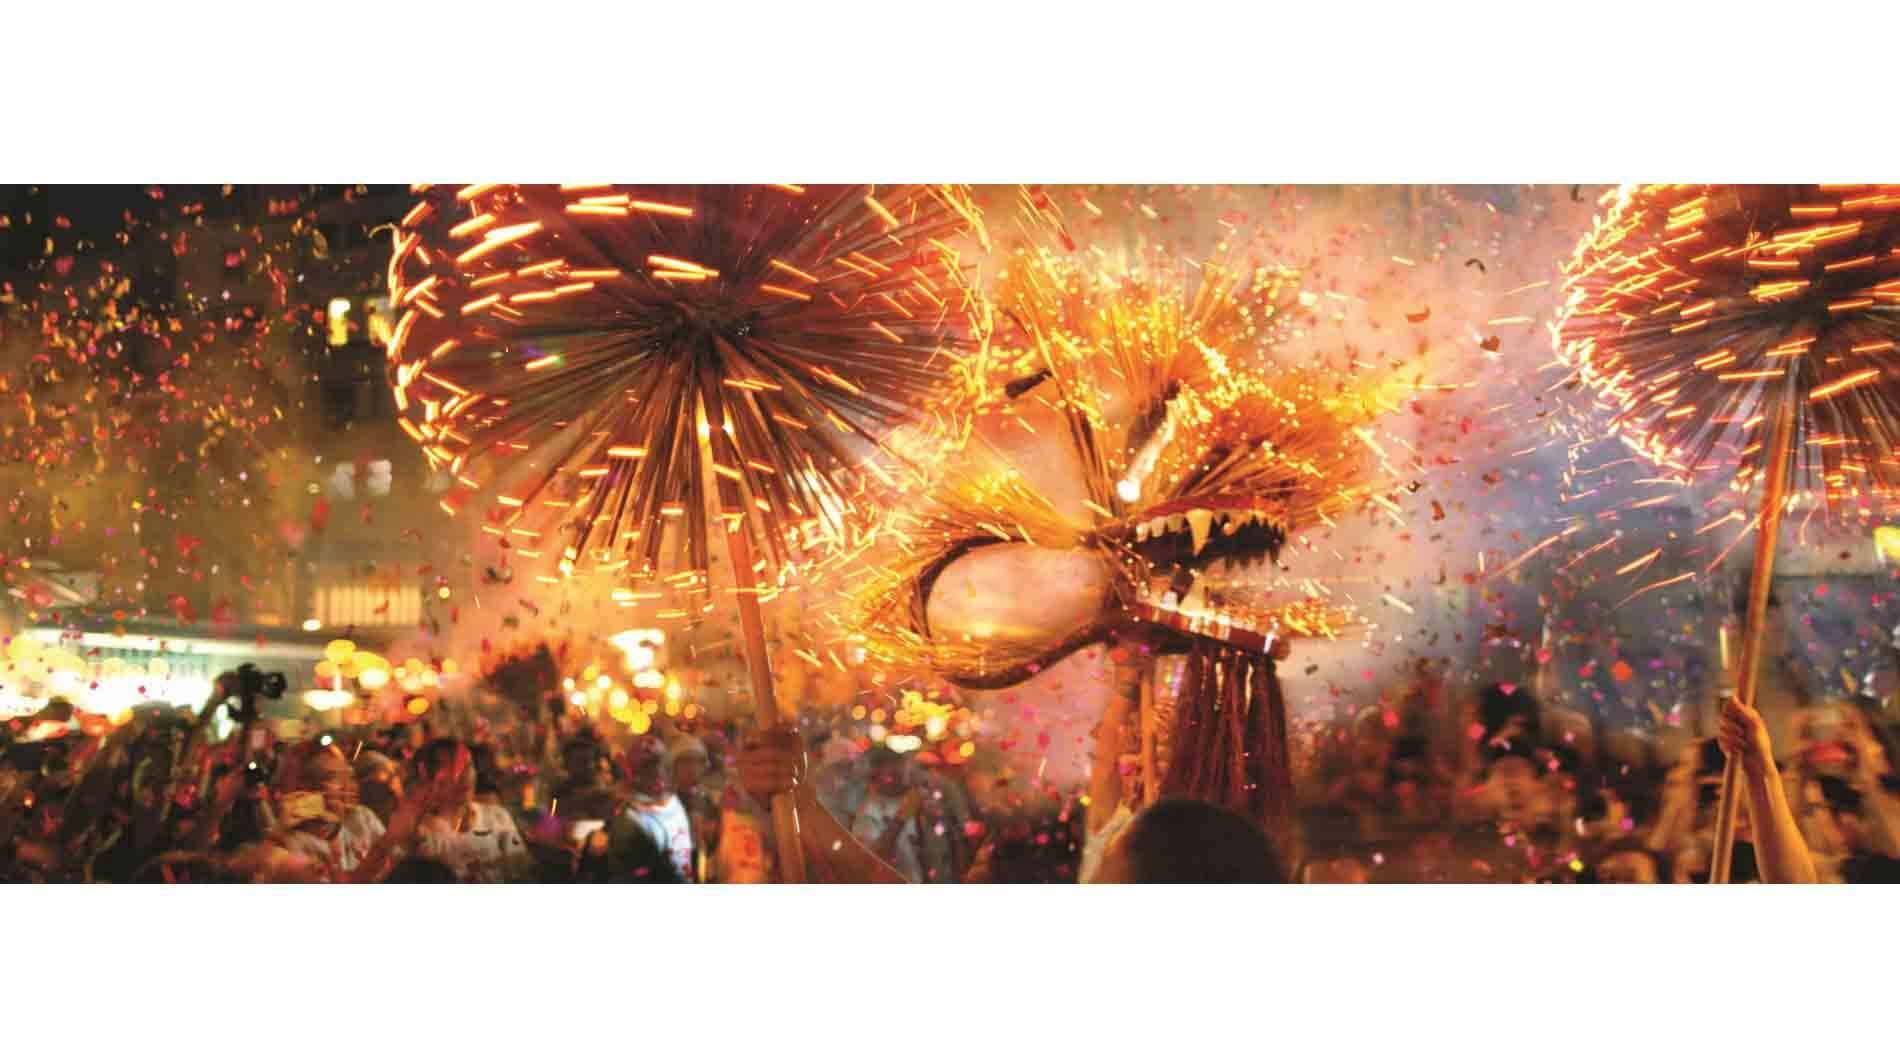 Festival Pertengan Musim Gugur Vietnam